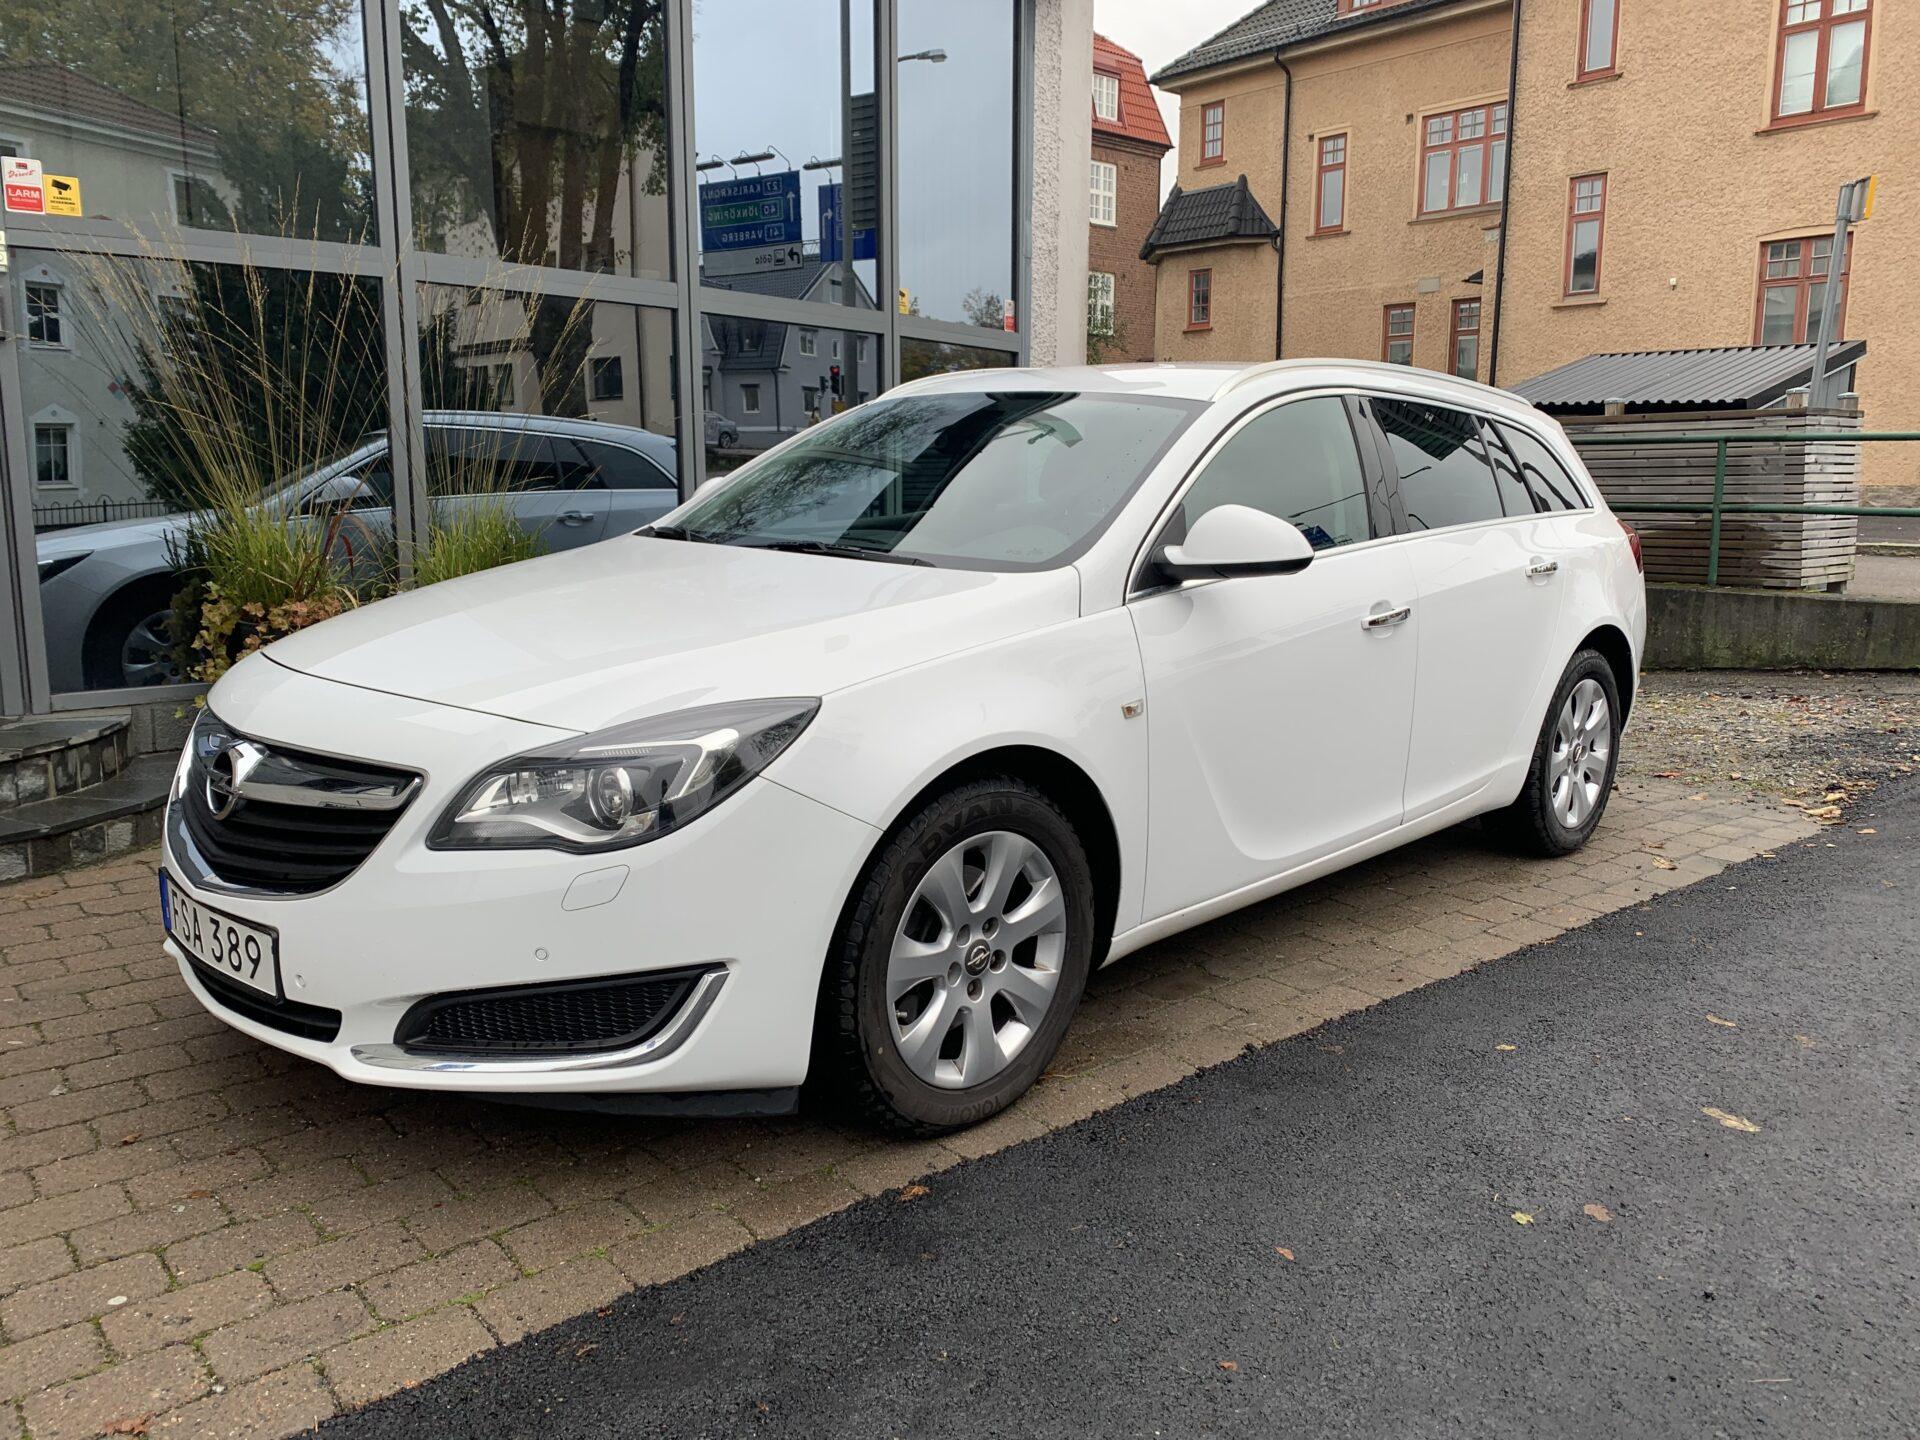 Opel Insignia 2.0 CDTI 4×4 Aut 163hk / Drag